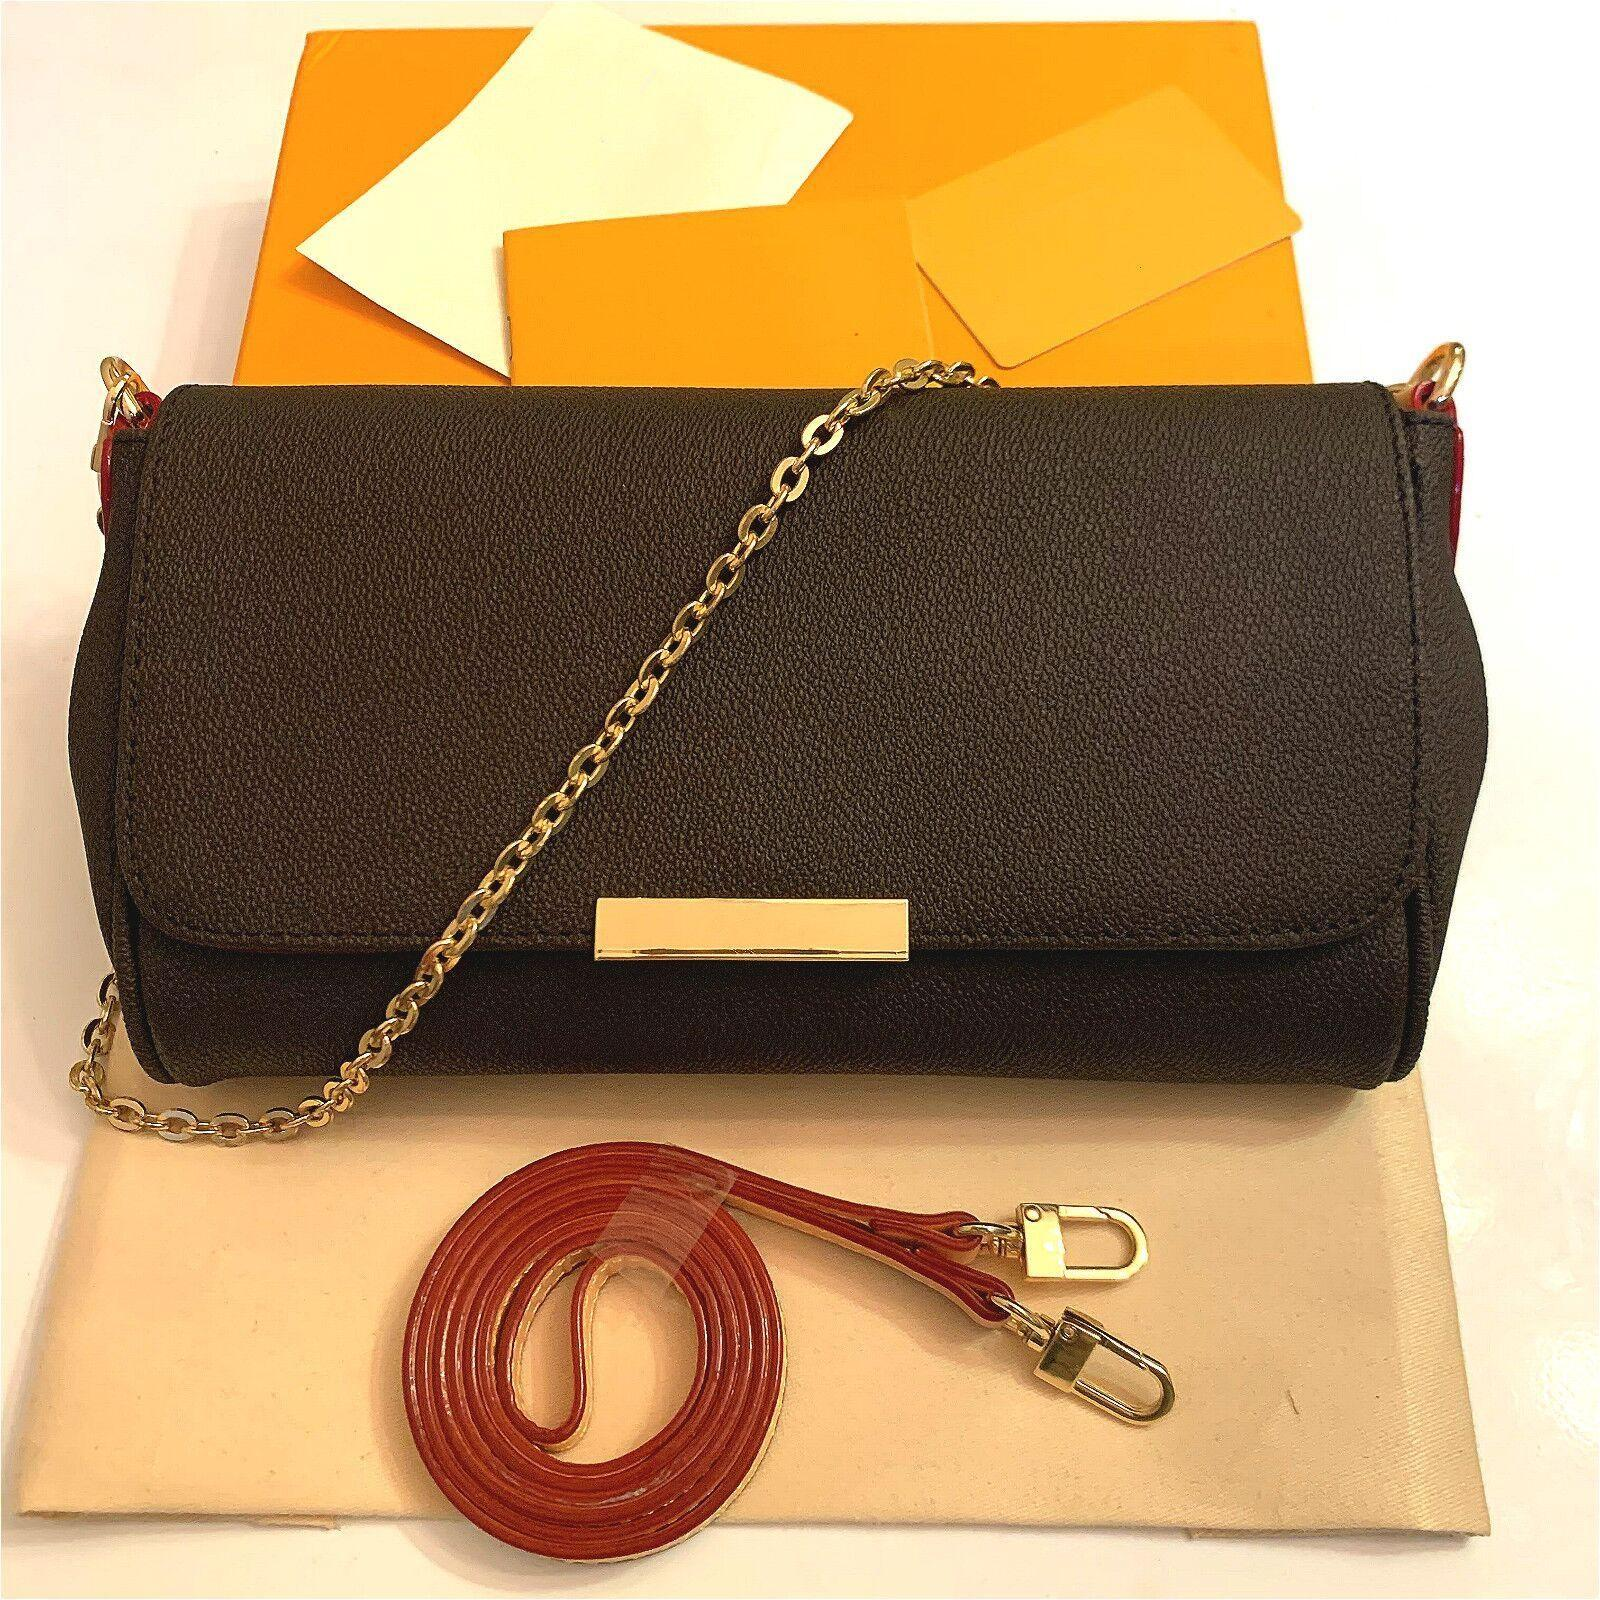 HOT WOMENS Cuir Messenger Sac Fashion Luxurys Designers Sacs Sac Sac Mens Hommes Épaule Lady Tottes Sac à main Handbags Backbody Sac à dos Portefeuille